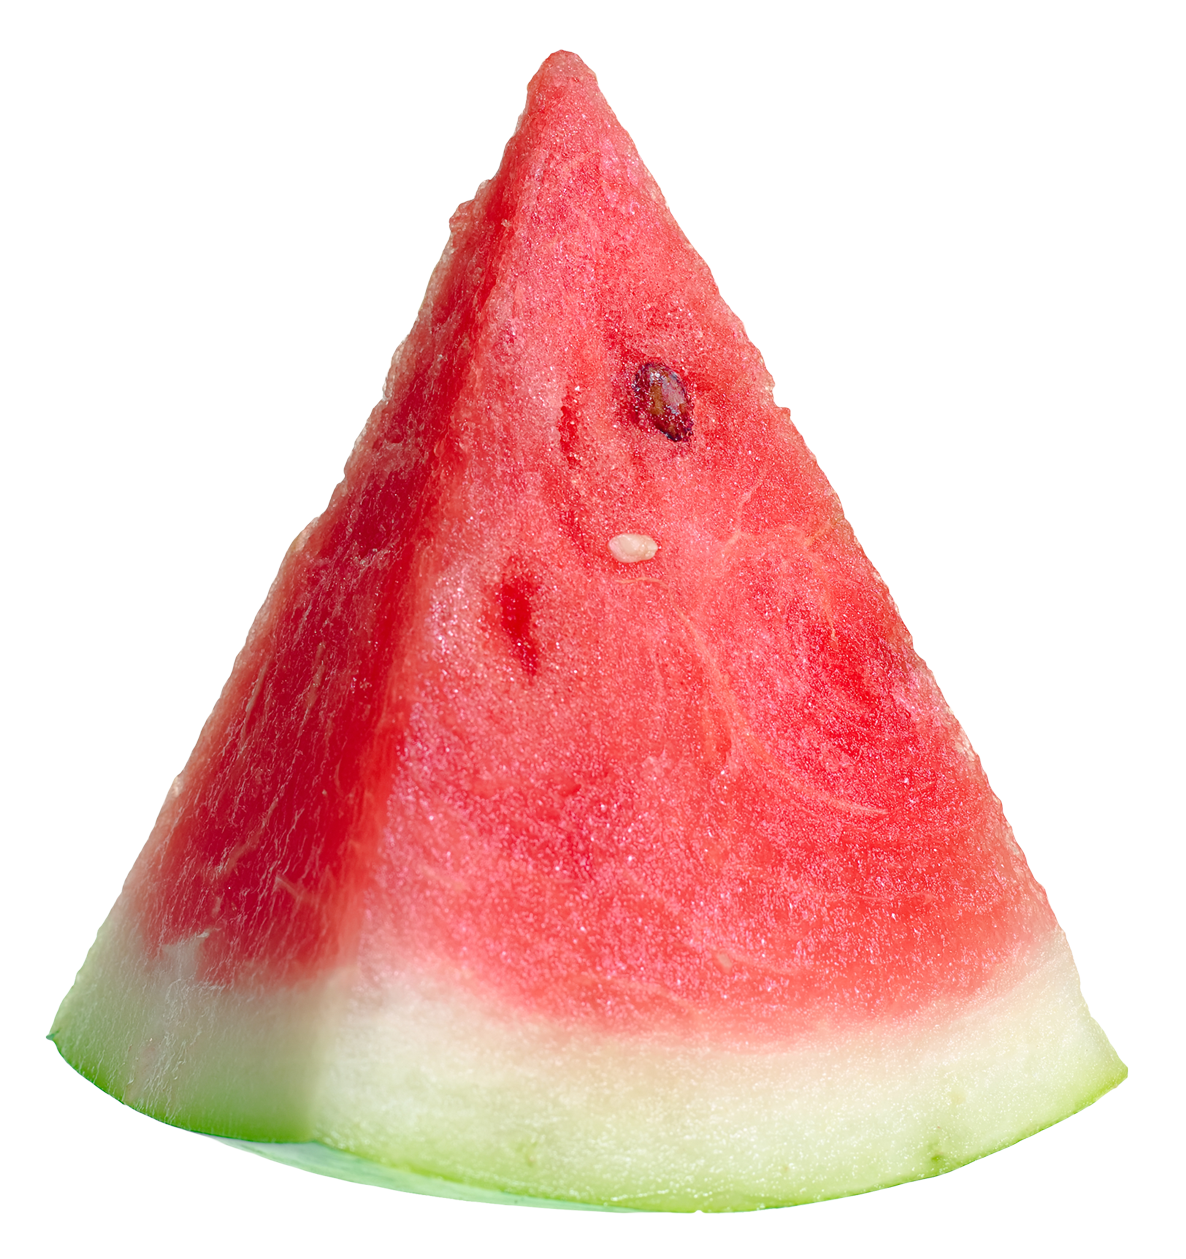 Slice png image pngpix. Watermelon clipart watermelon wedge